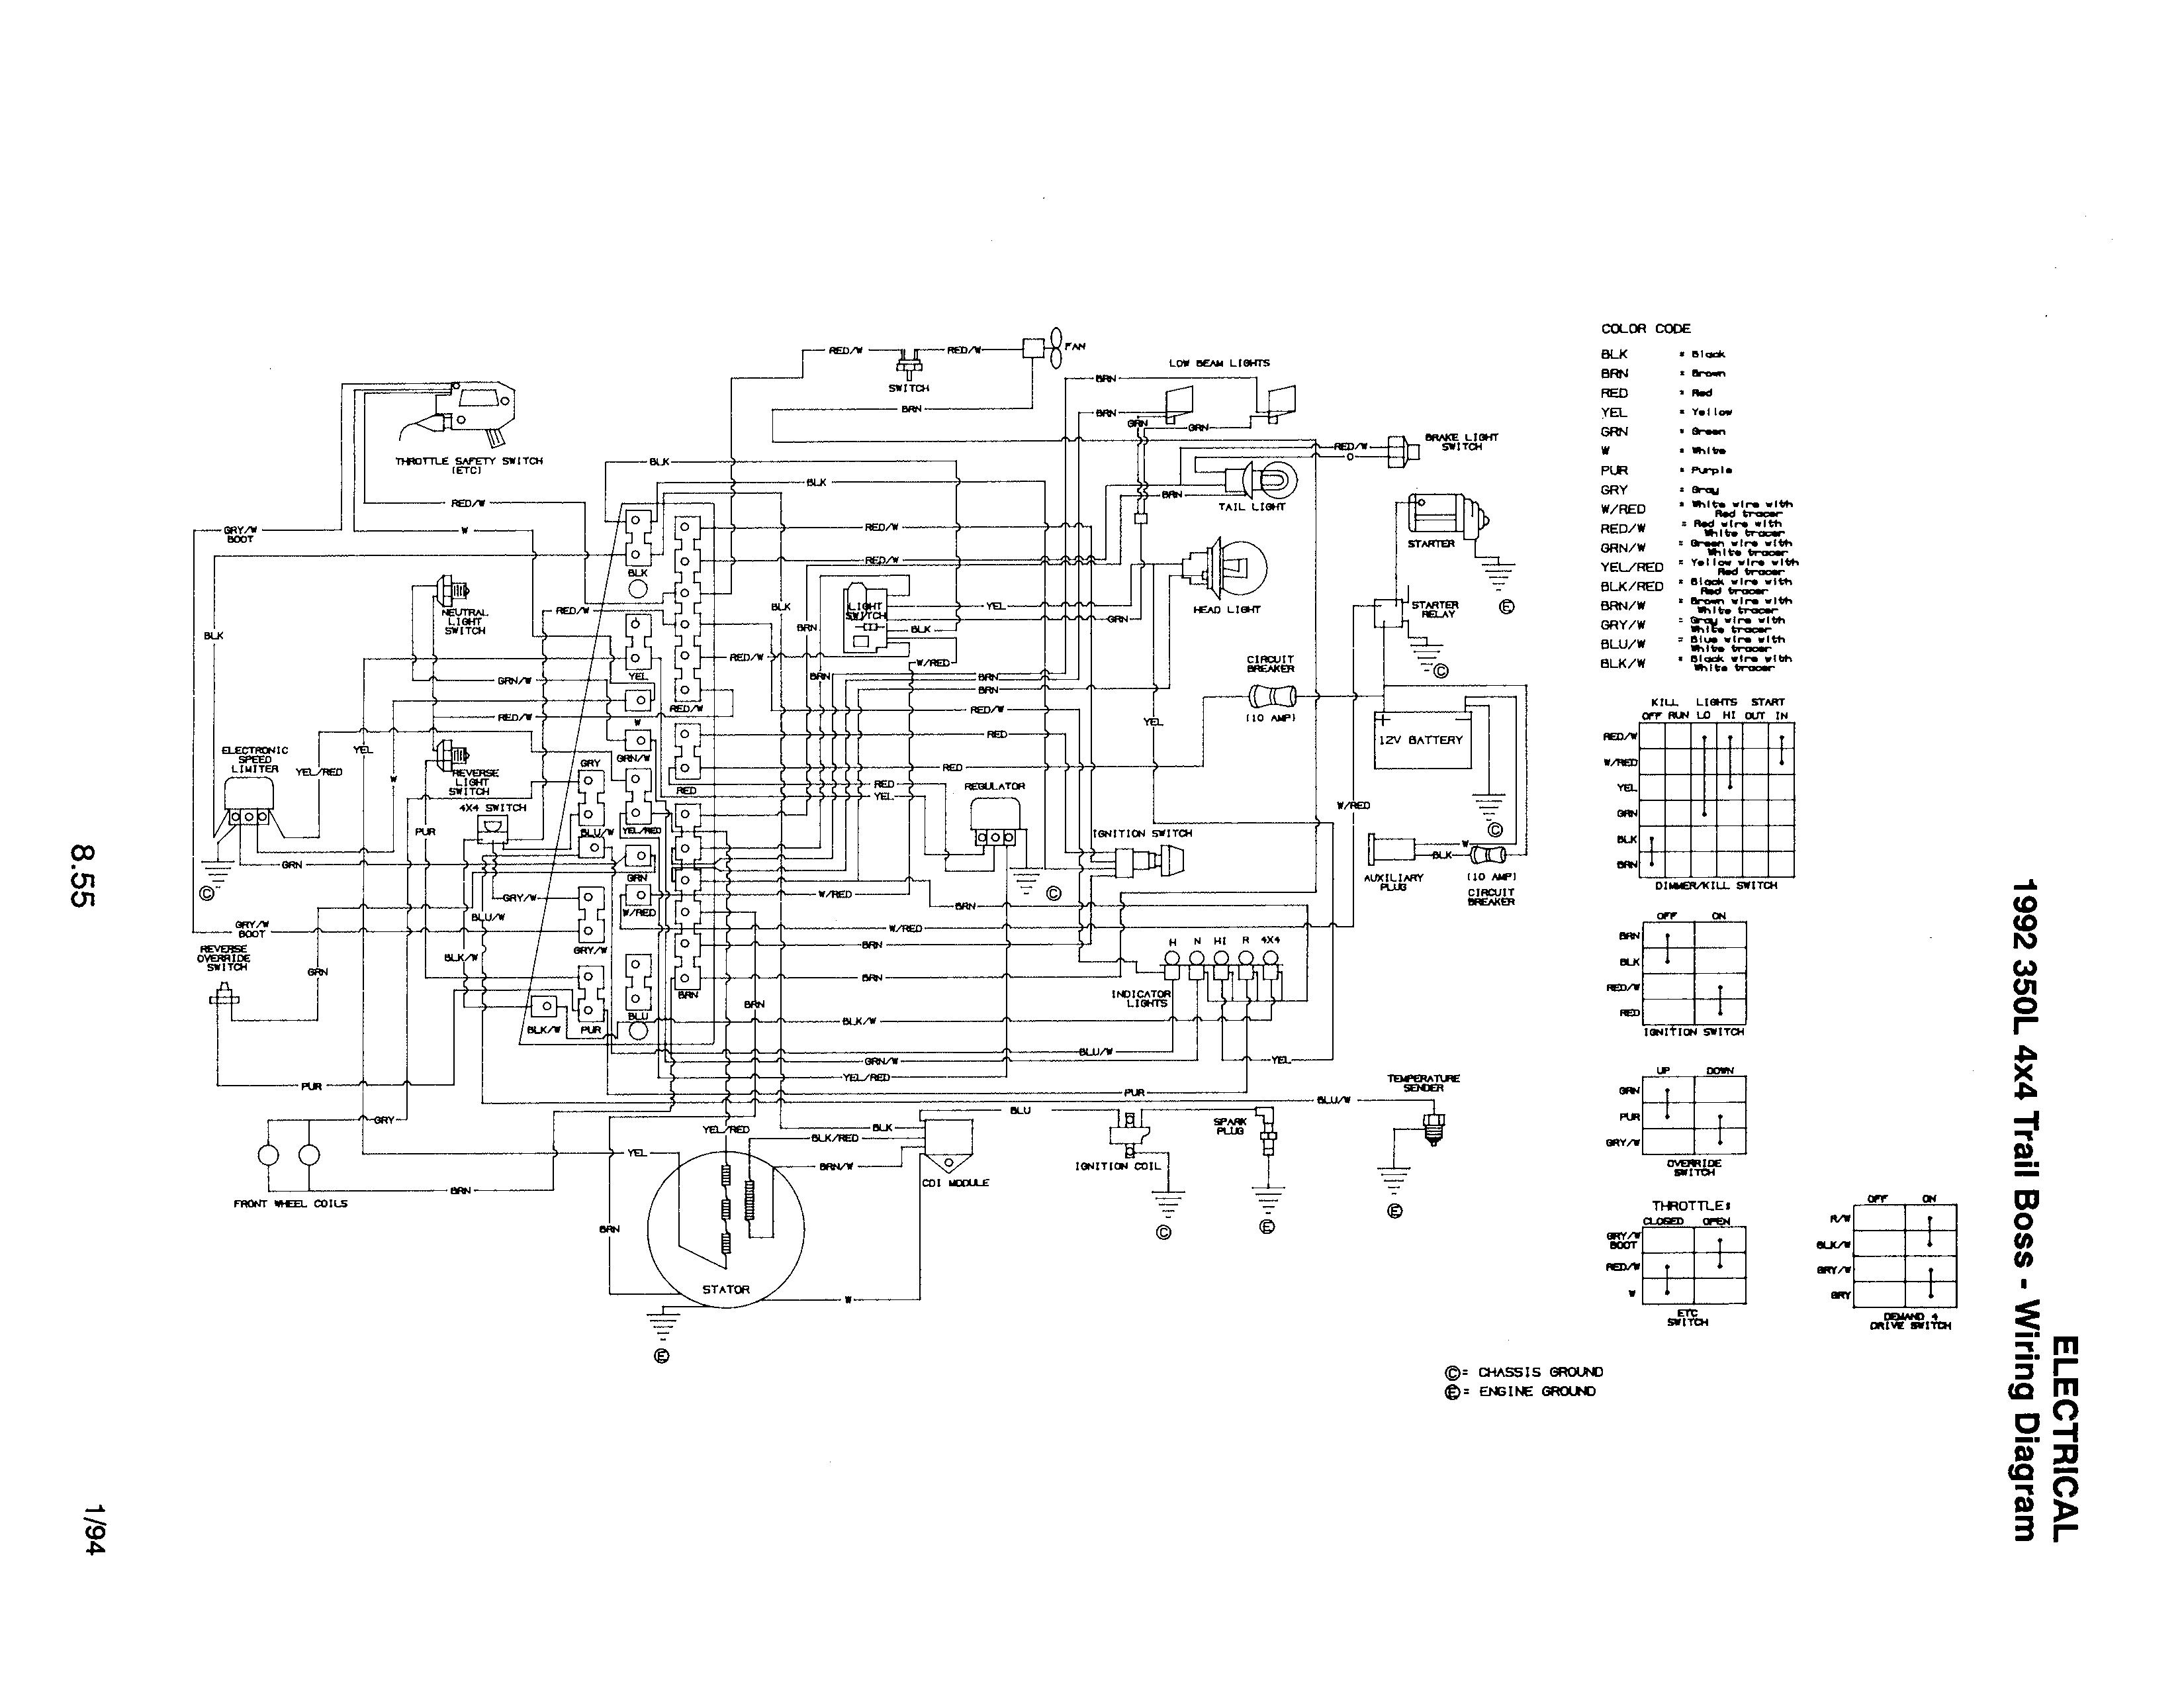 1993 350l 4x4 Switch Help Please